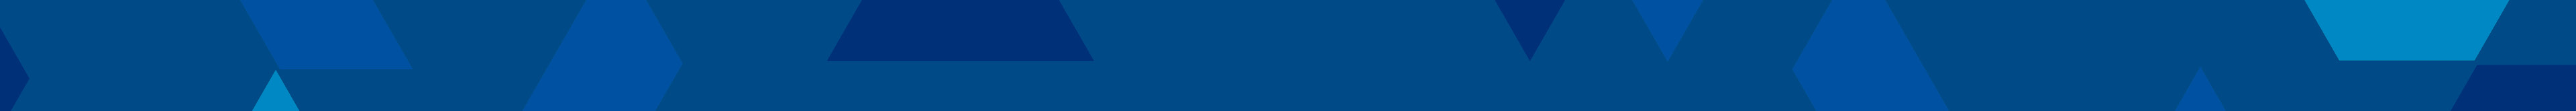 Nordic-Pattern-Banner-(11)